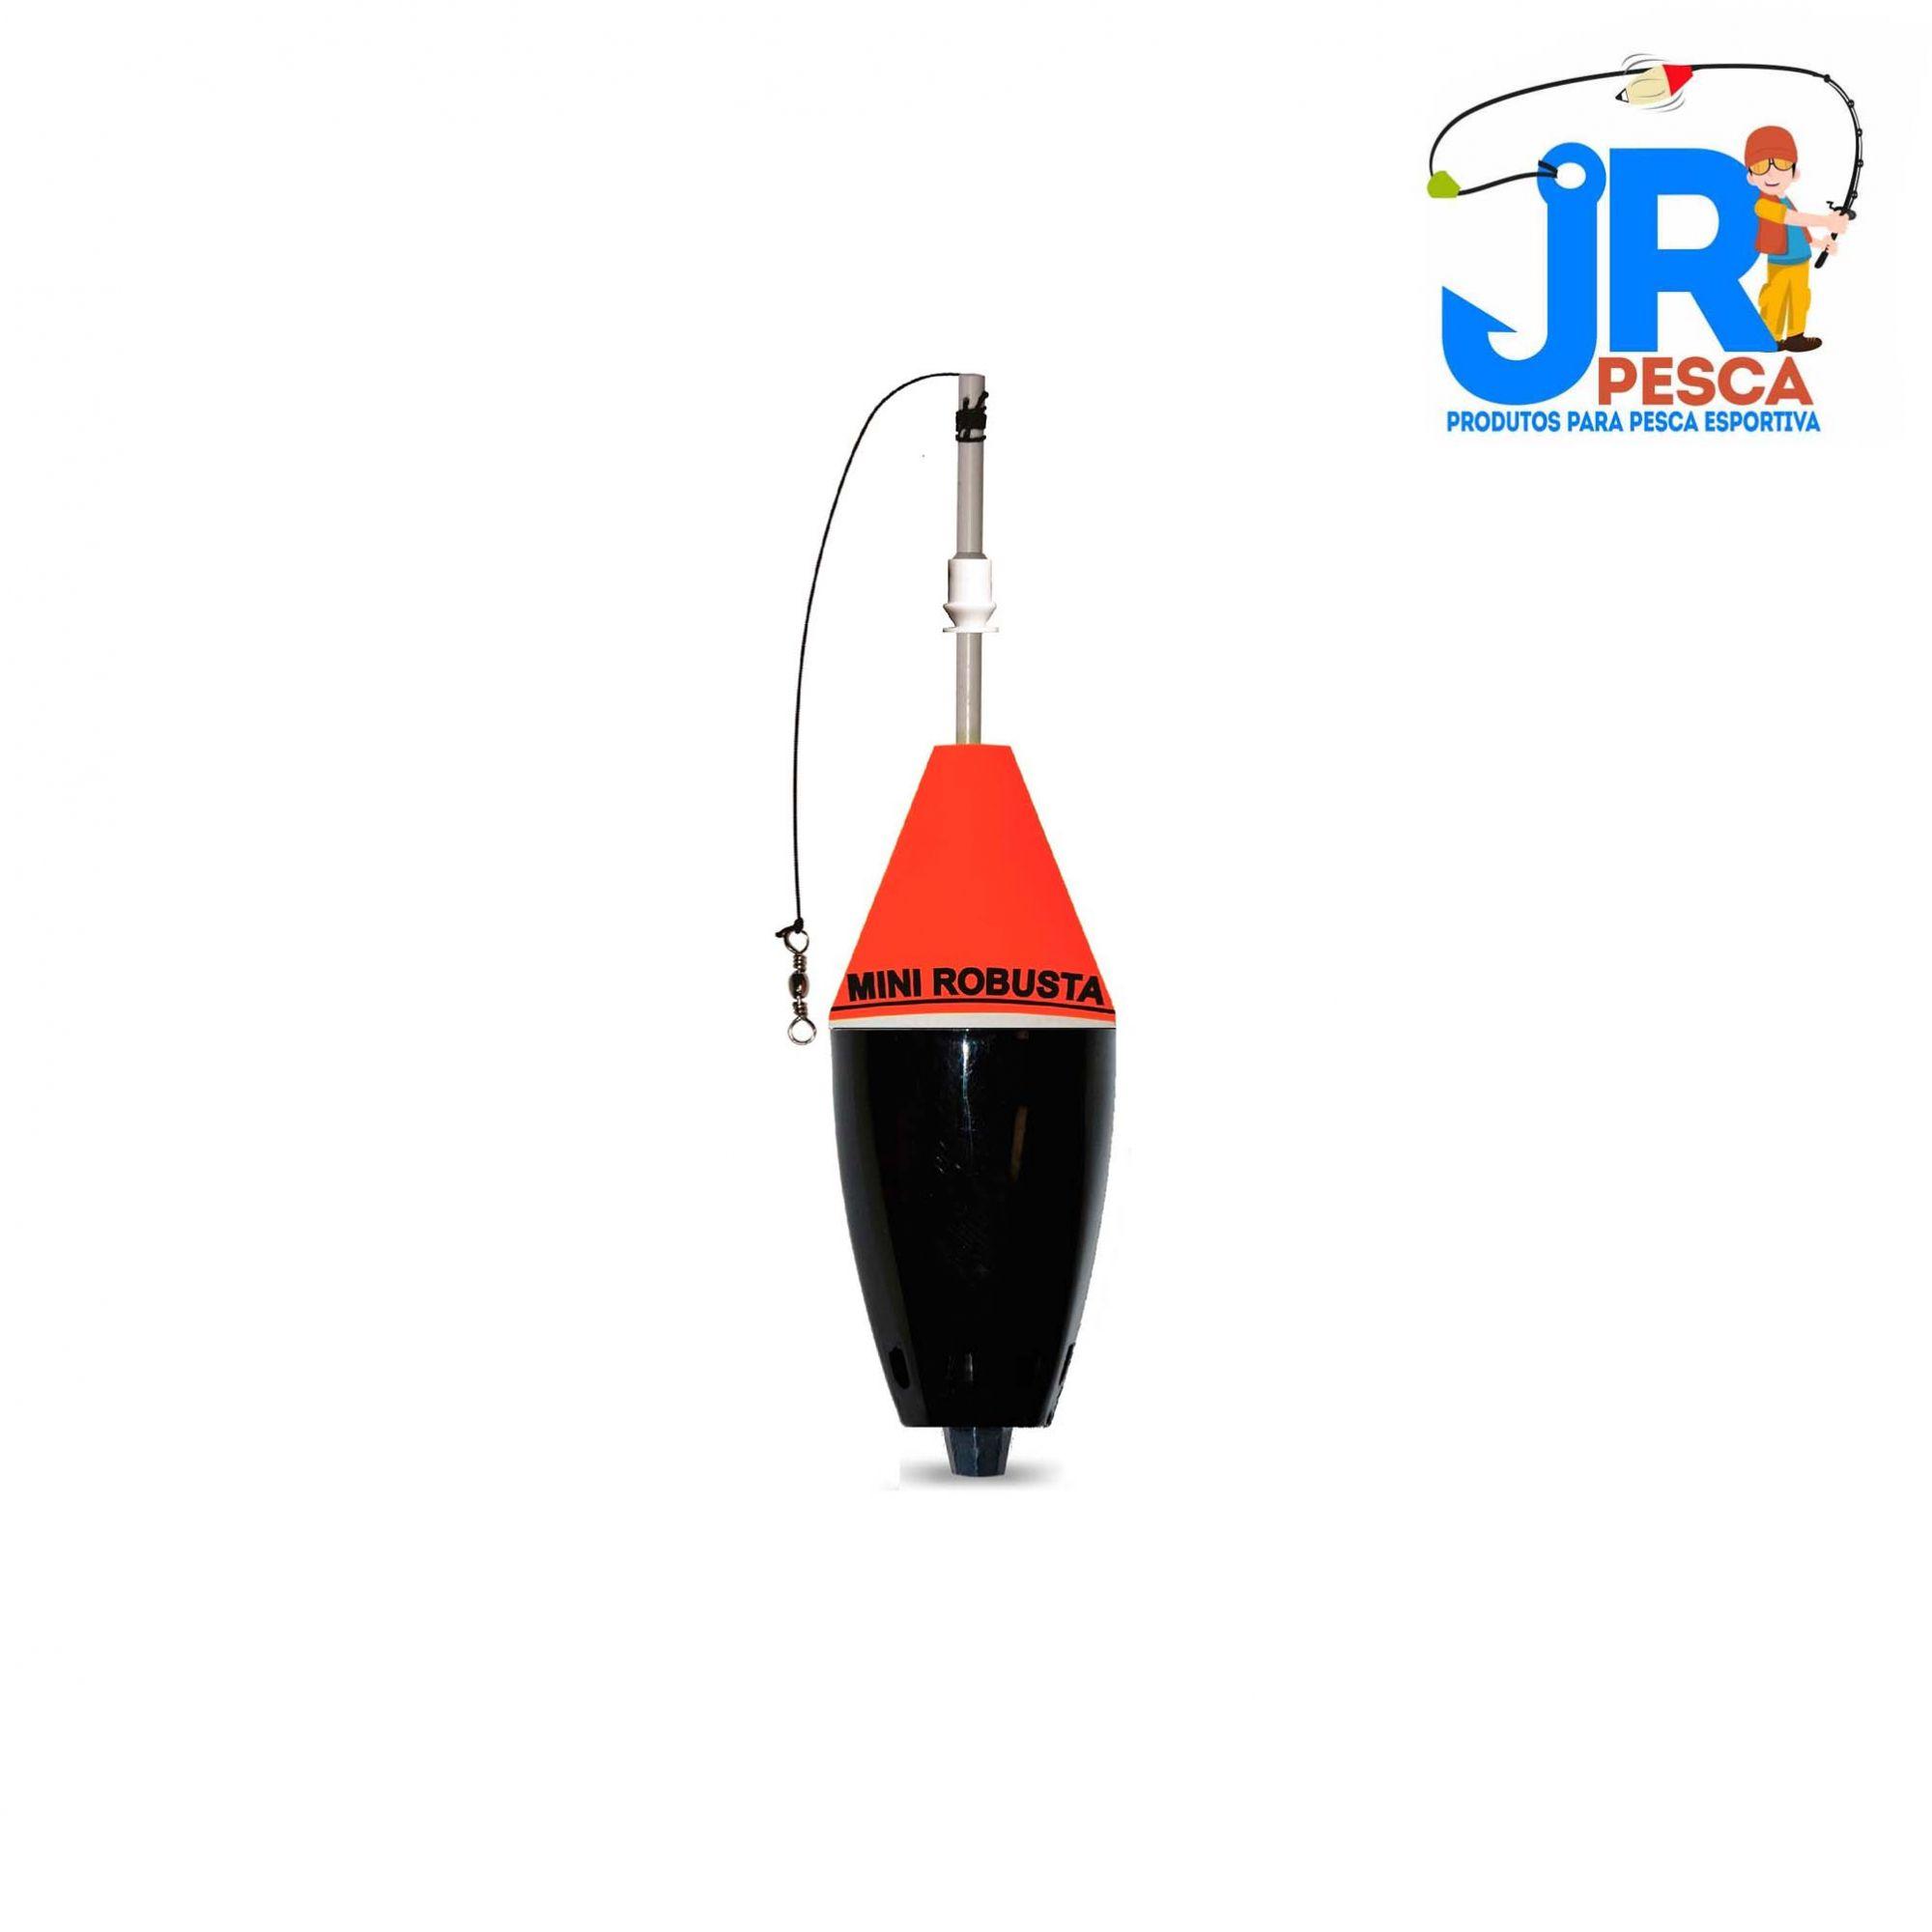 Boia Cevadeira Mini Robusta Vermelha Copo Preto